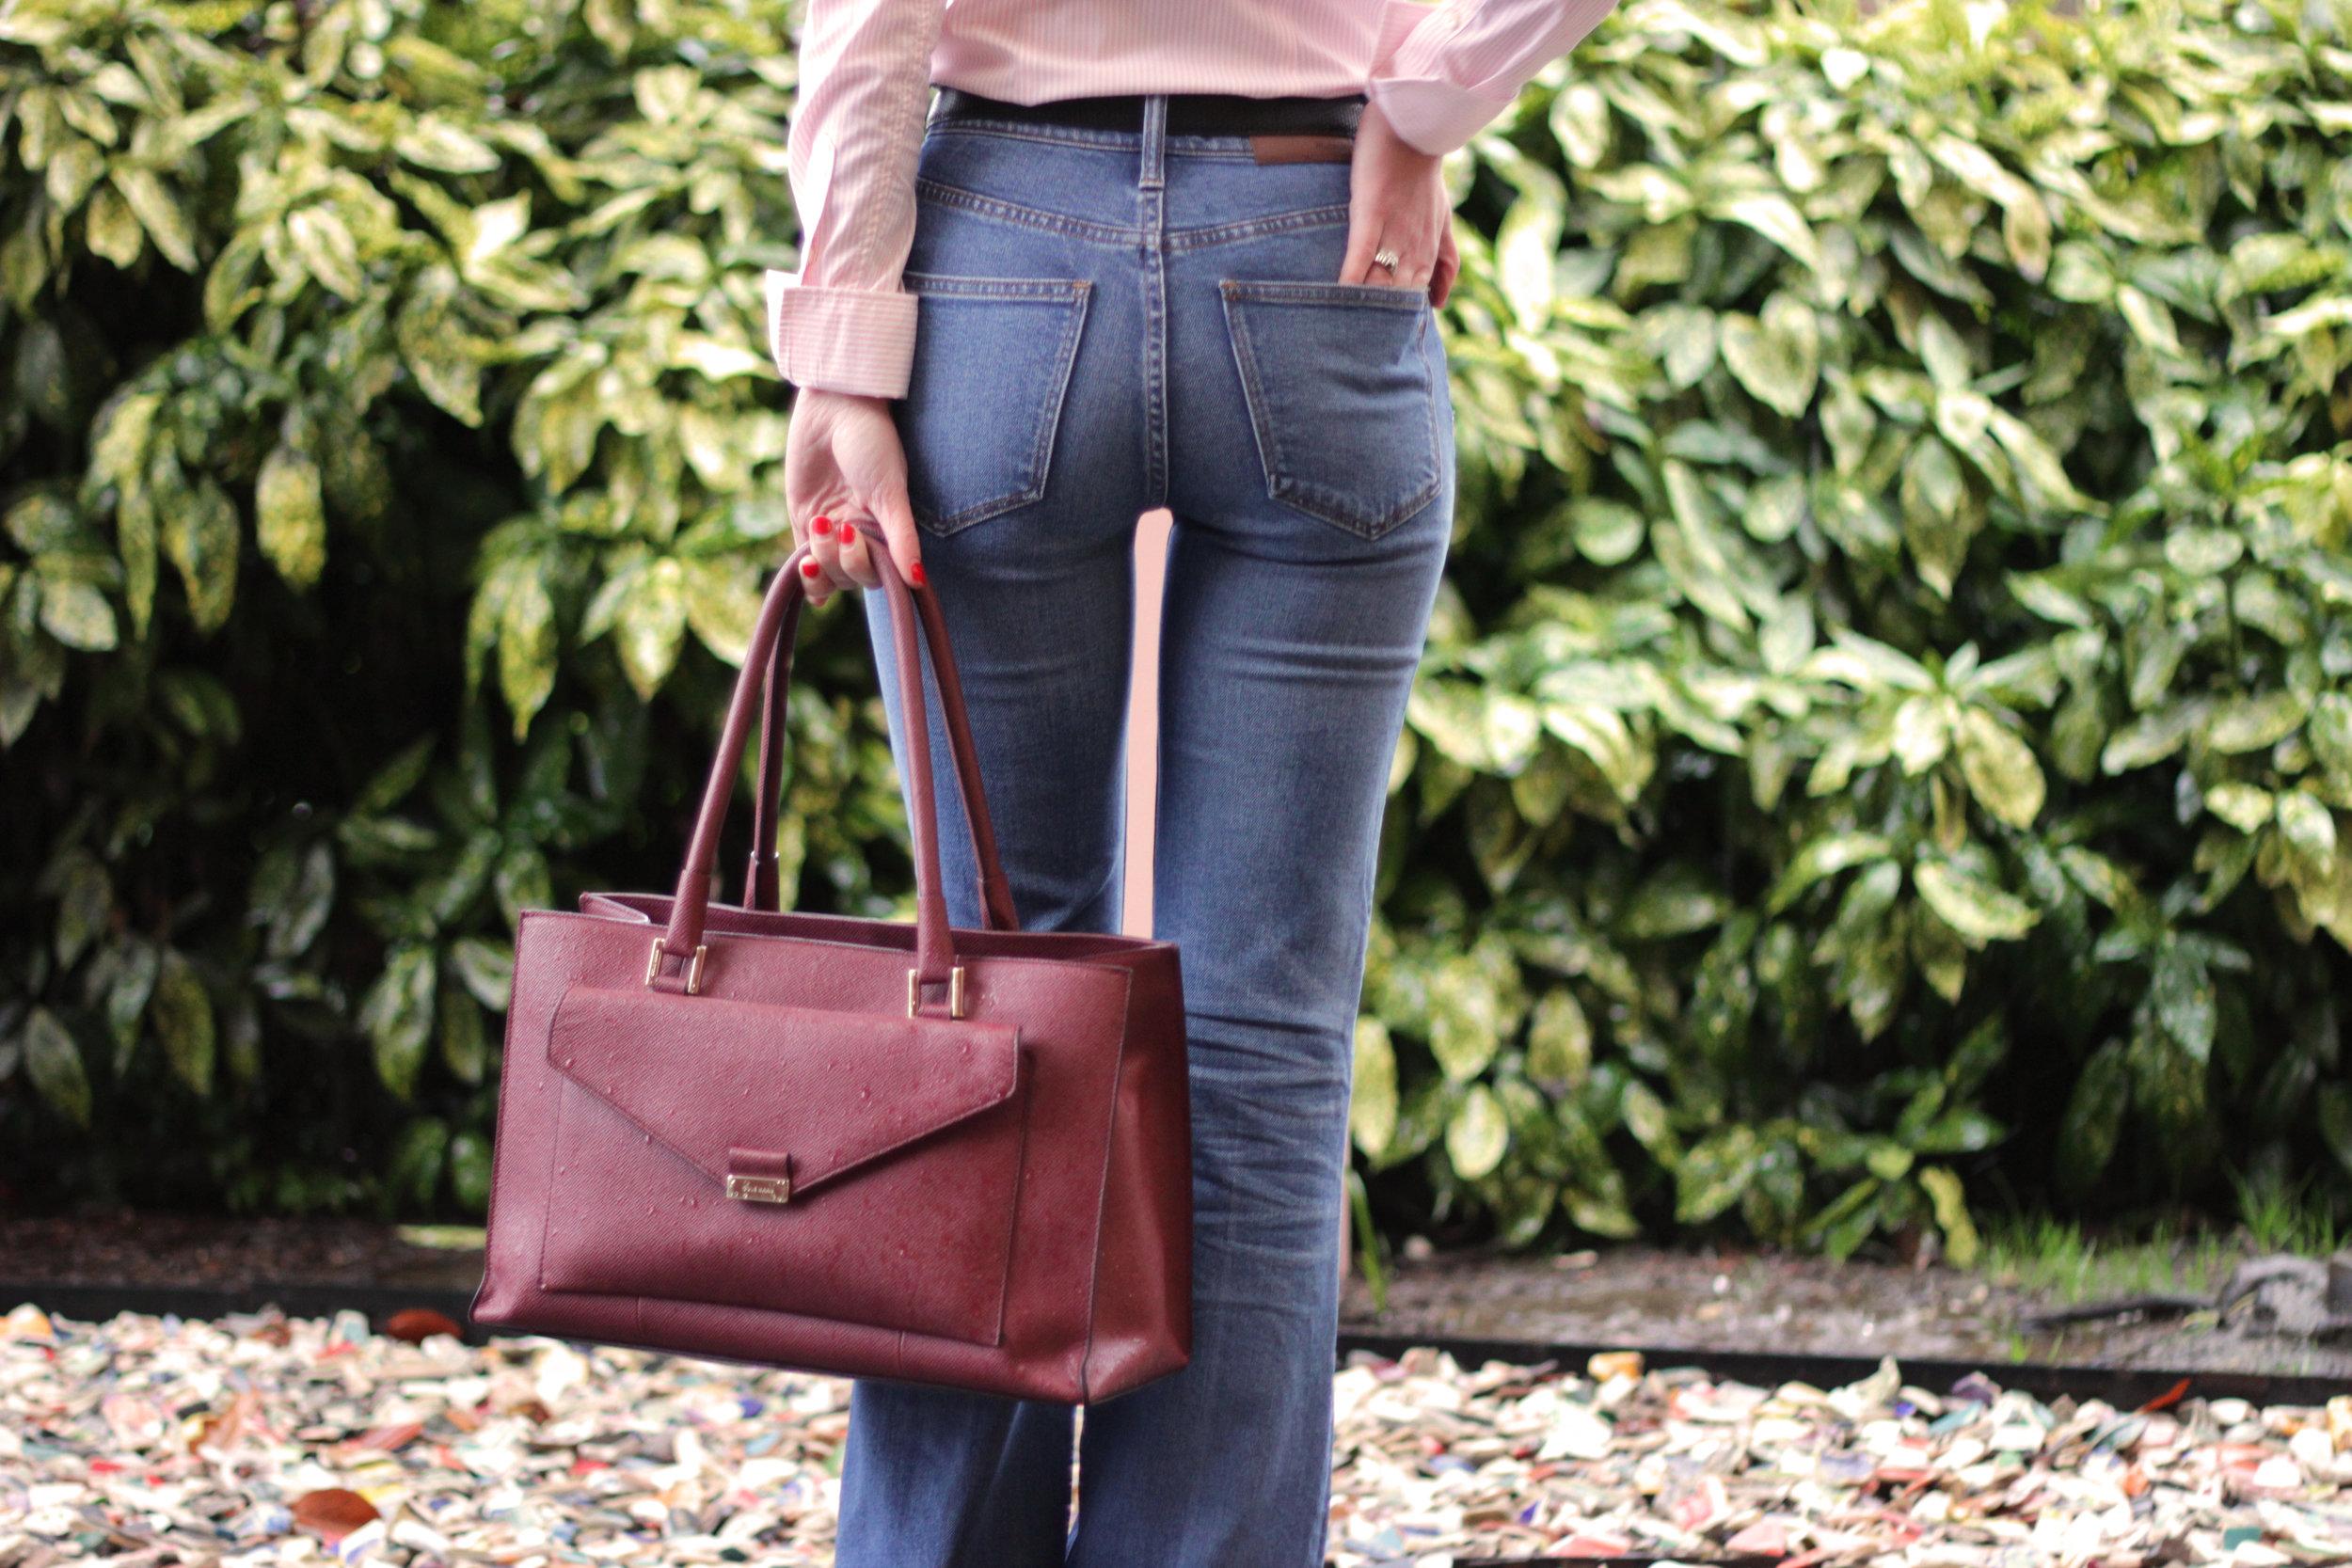 madewell-jeans-and-ferragamo-belt.jpg